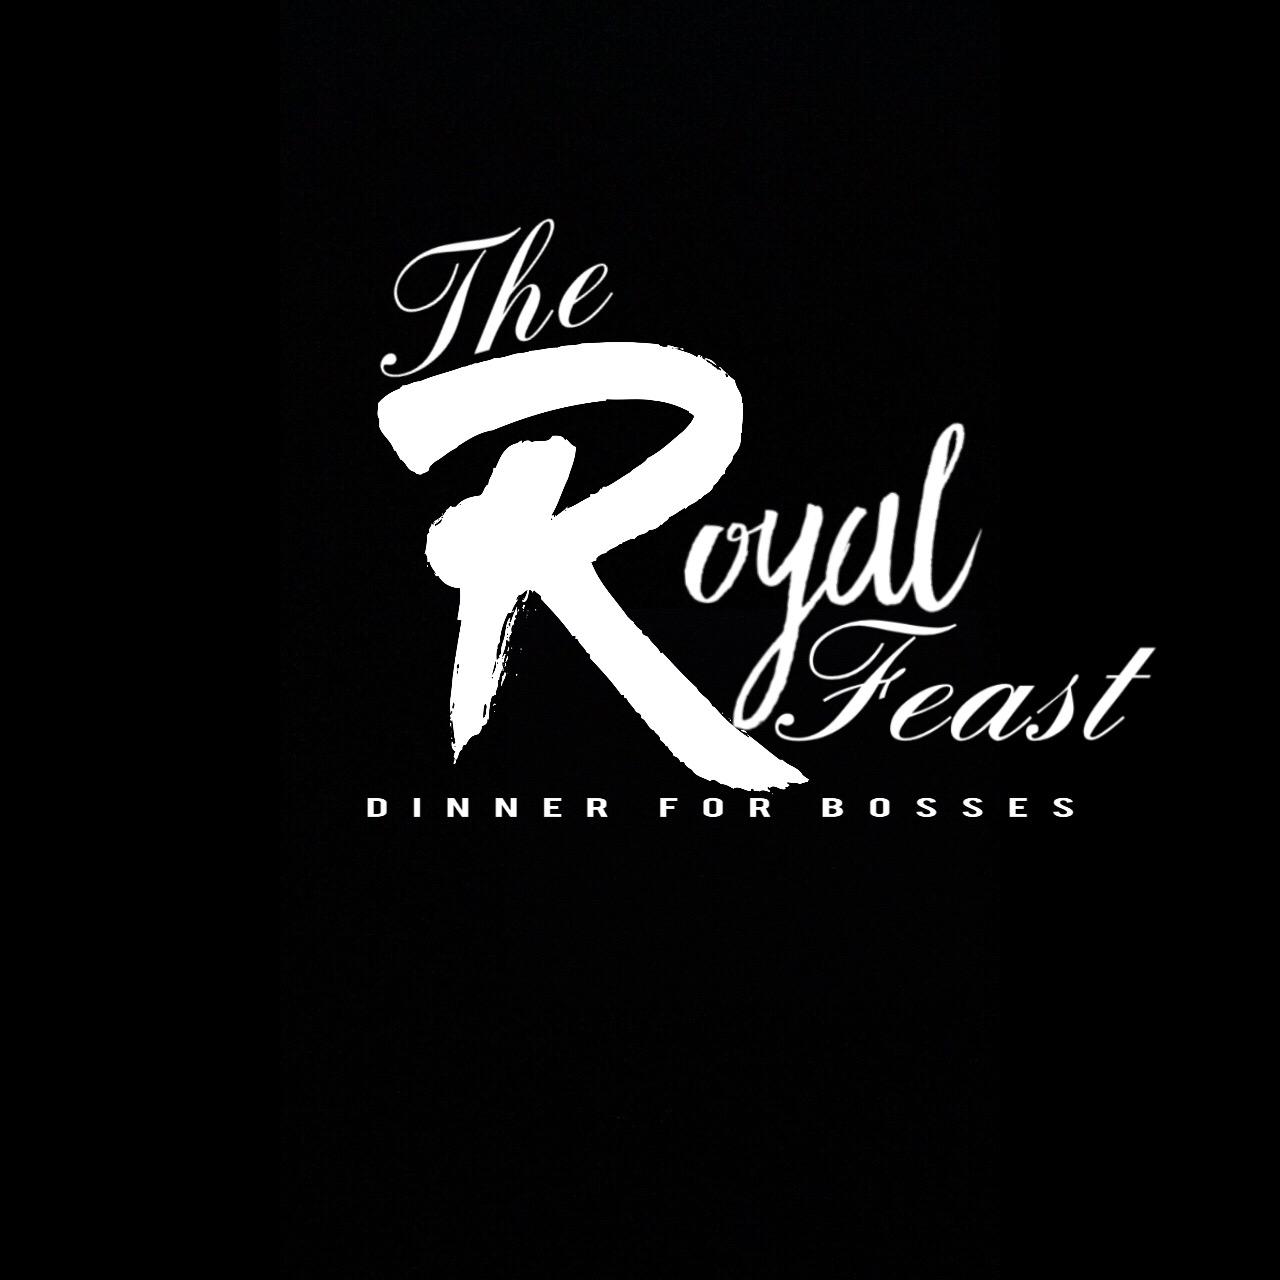 The Royal Feast